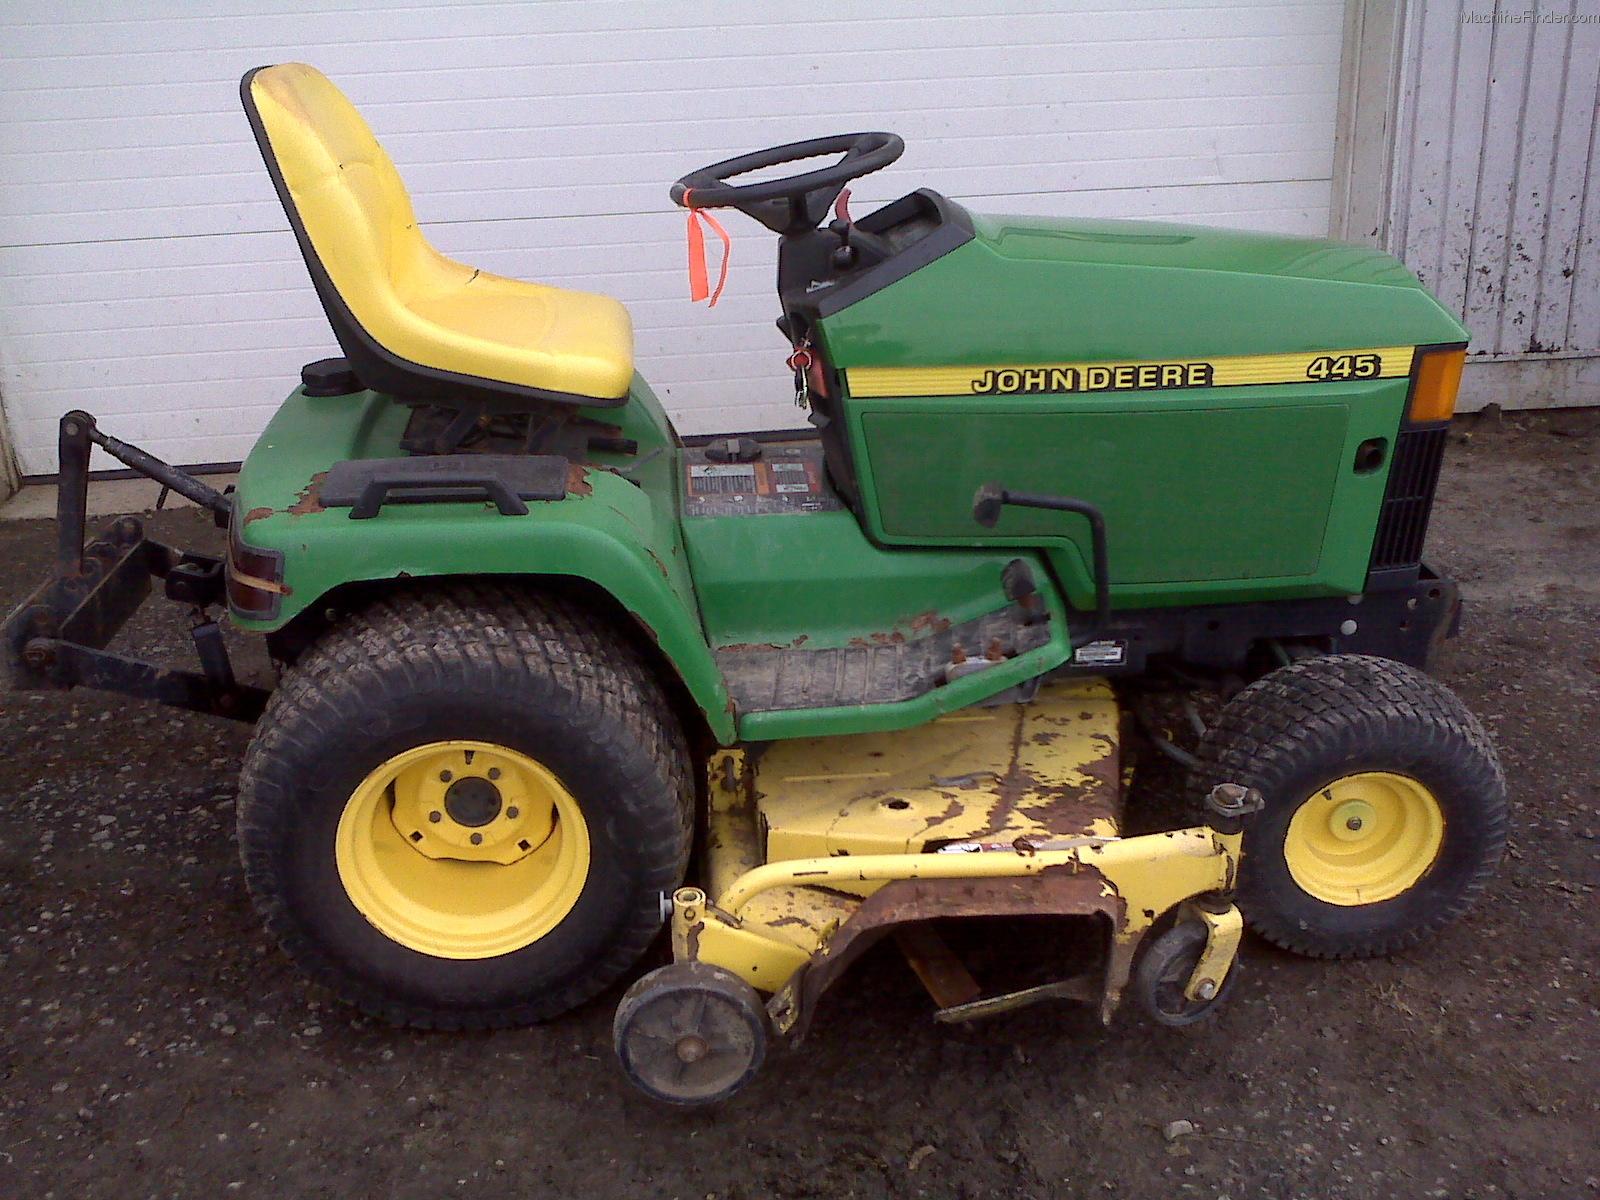 Lawn Tractor With Rear Pto : John deere rear pto car interior design